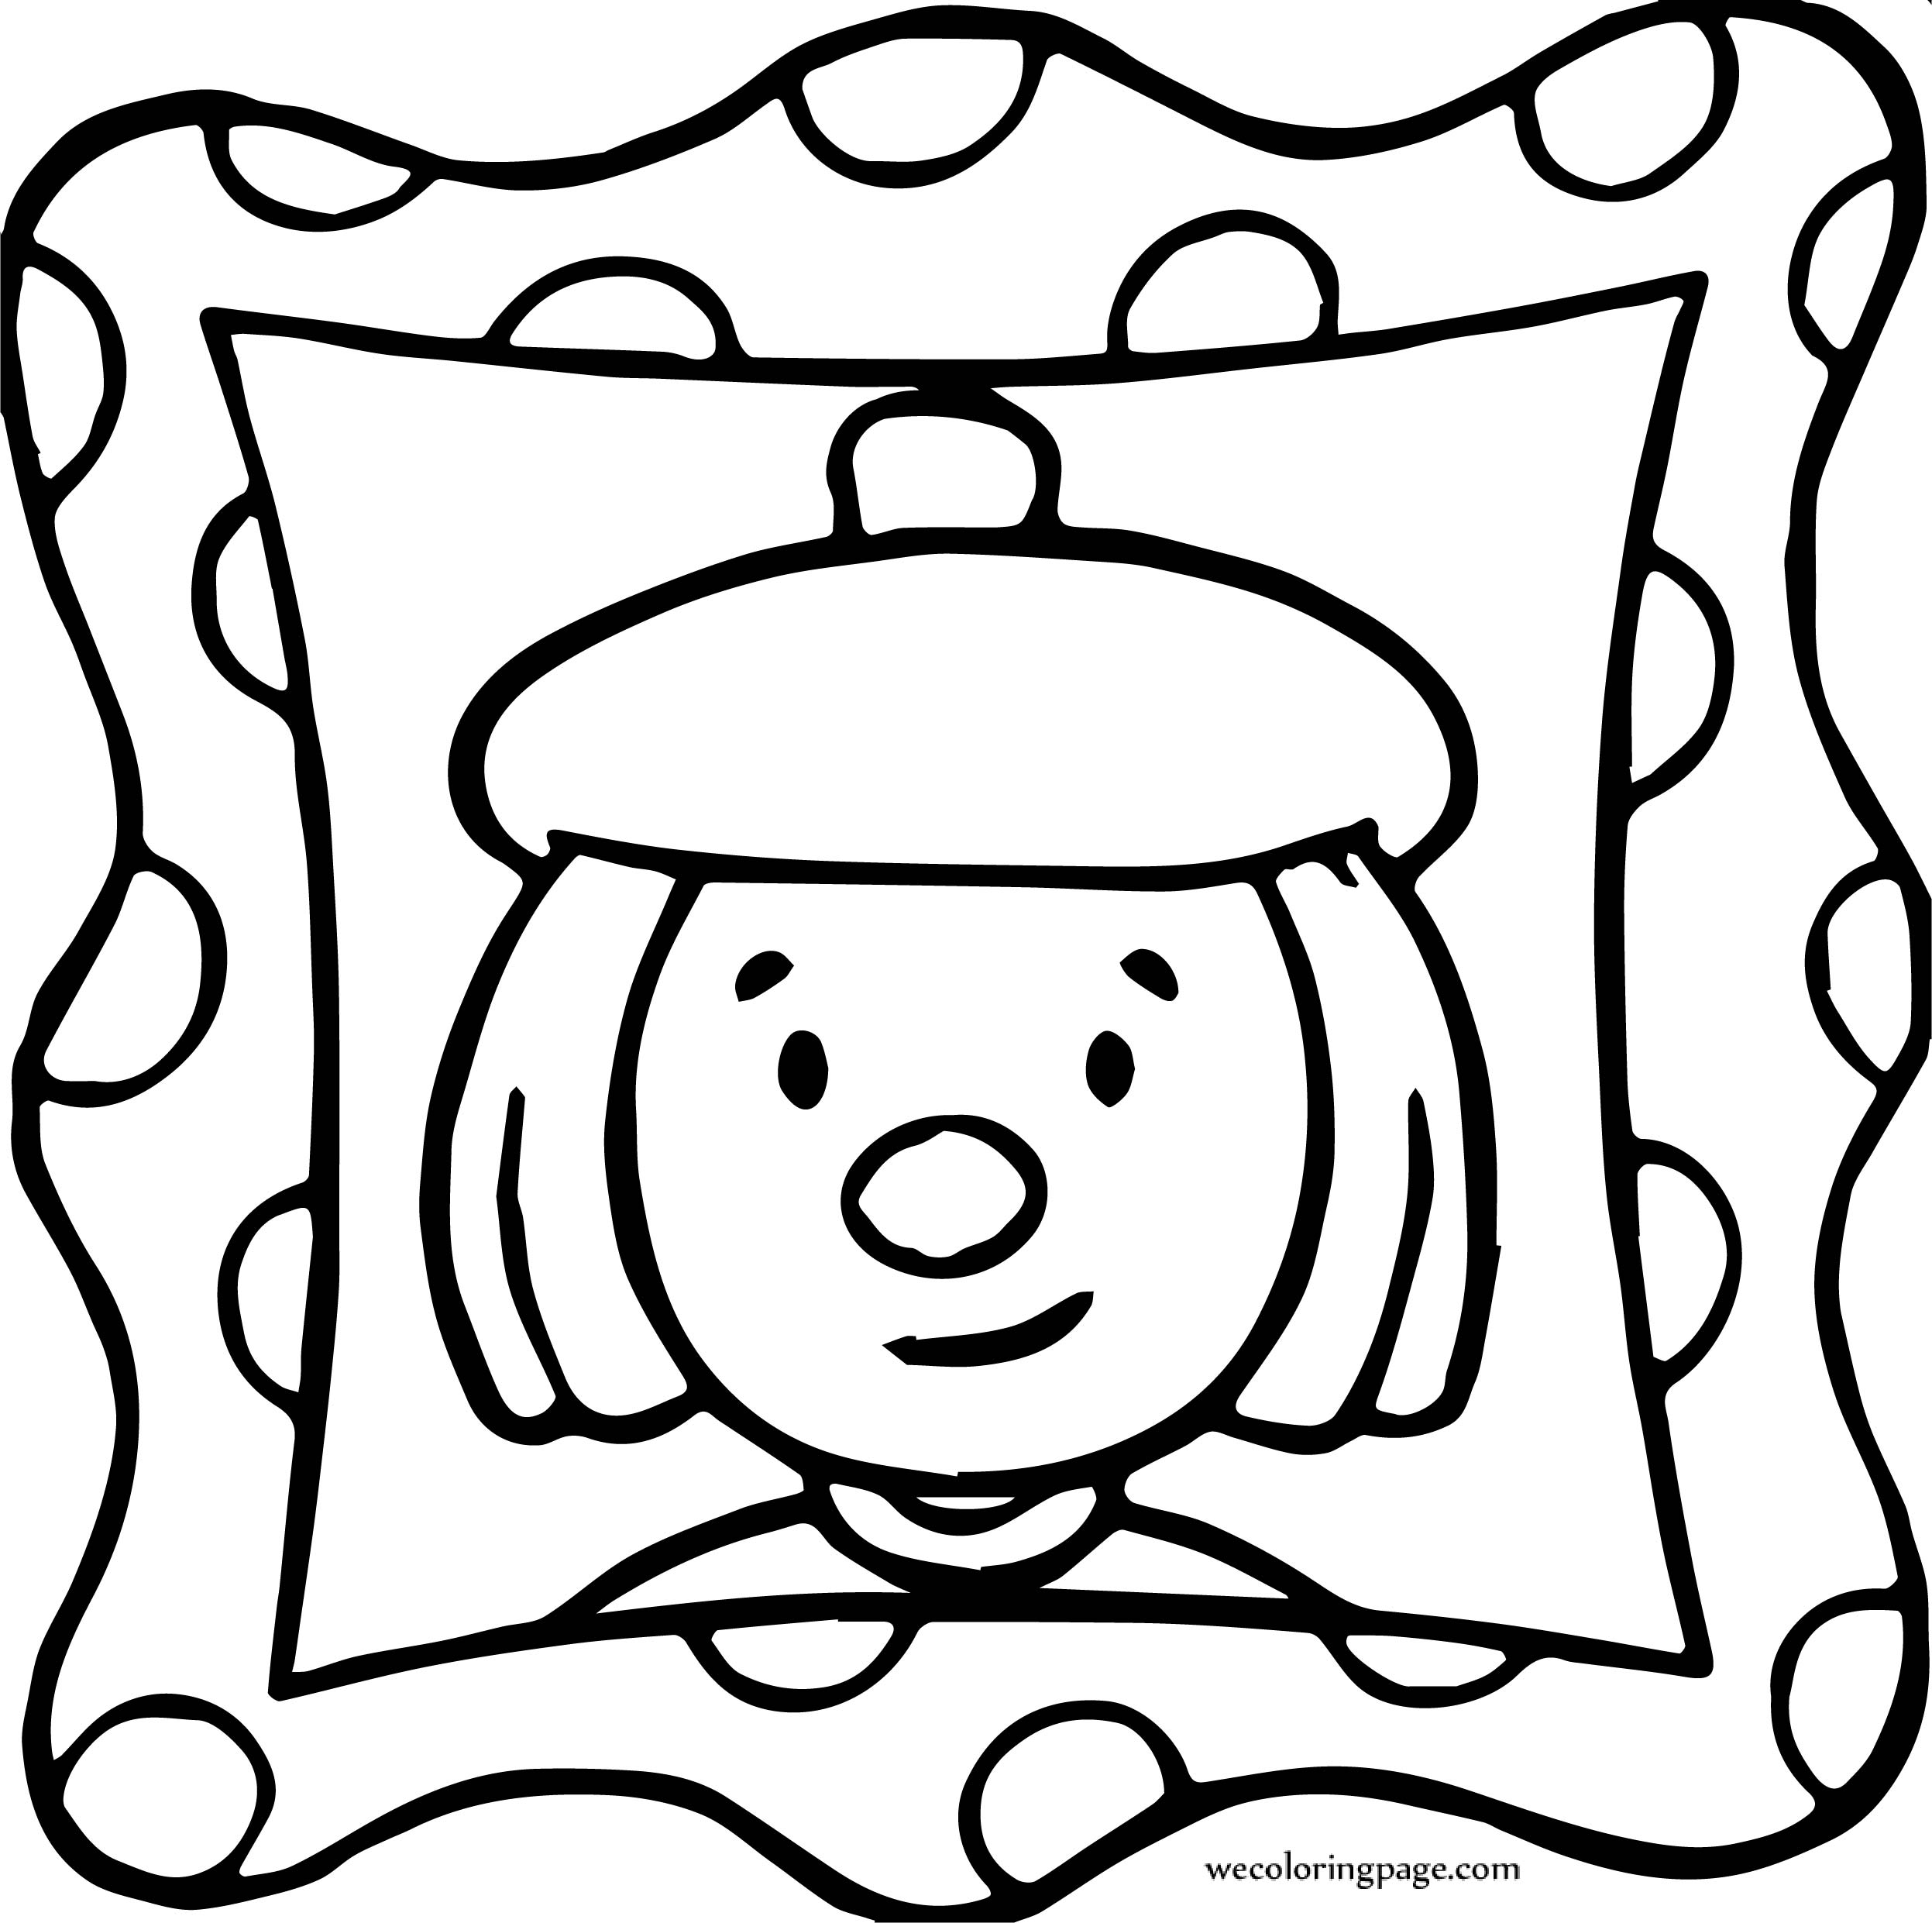 Circus Seal Coloring Page